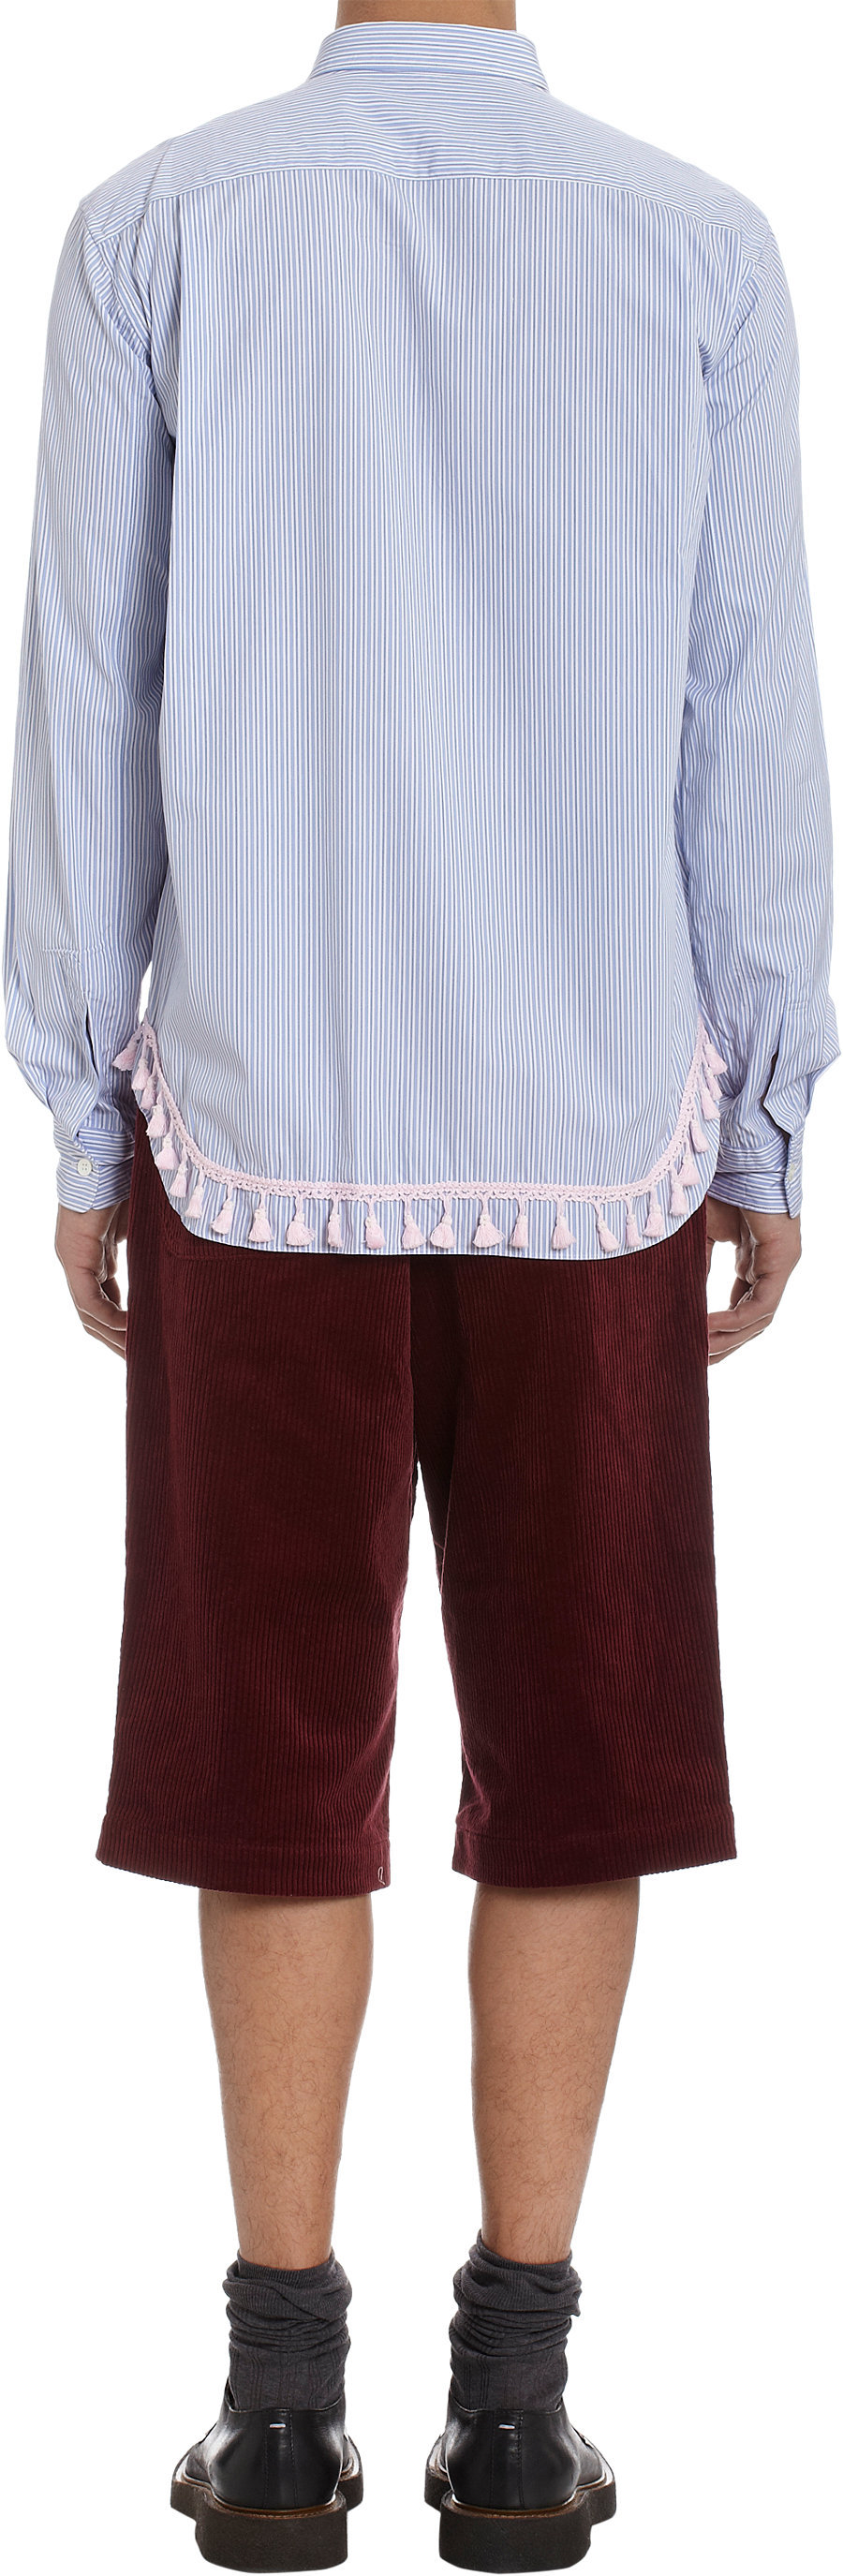 Lyst comme des gar ons tassel bottom shirt in blue for men for Mens shirt with tassels